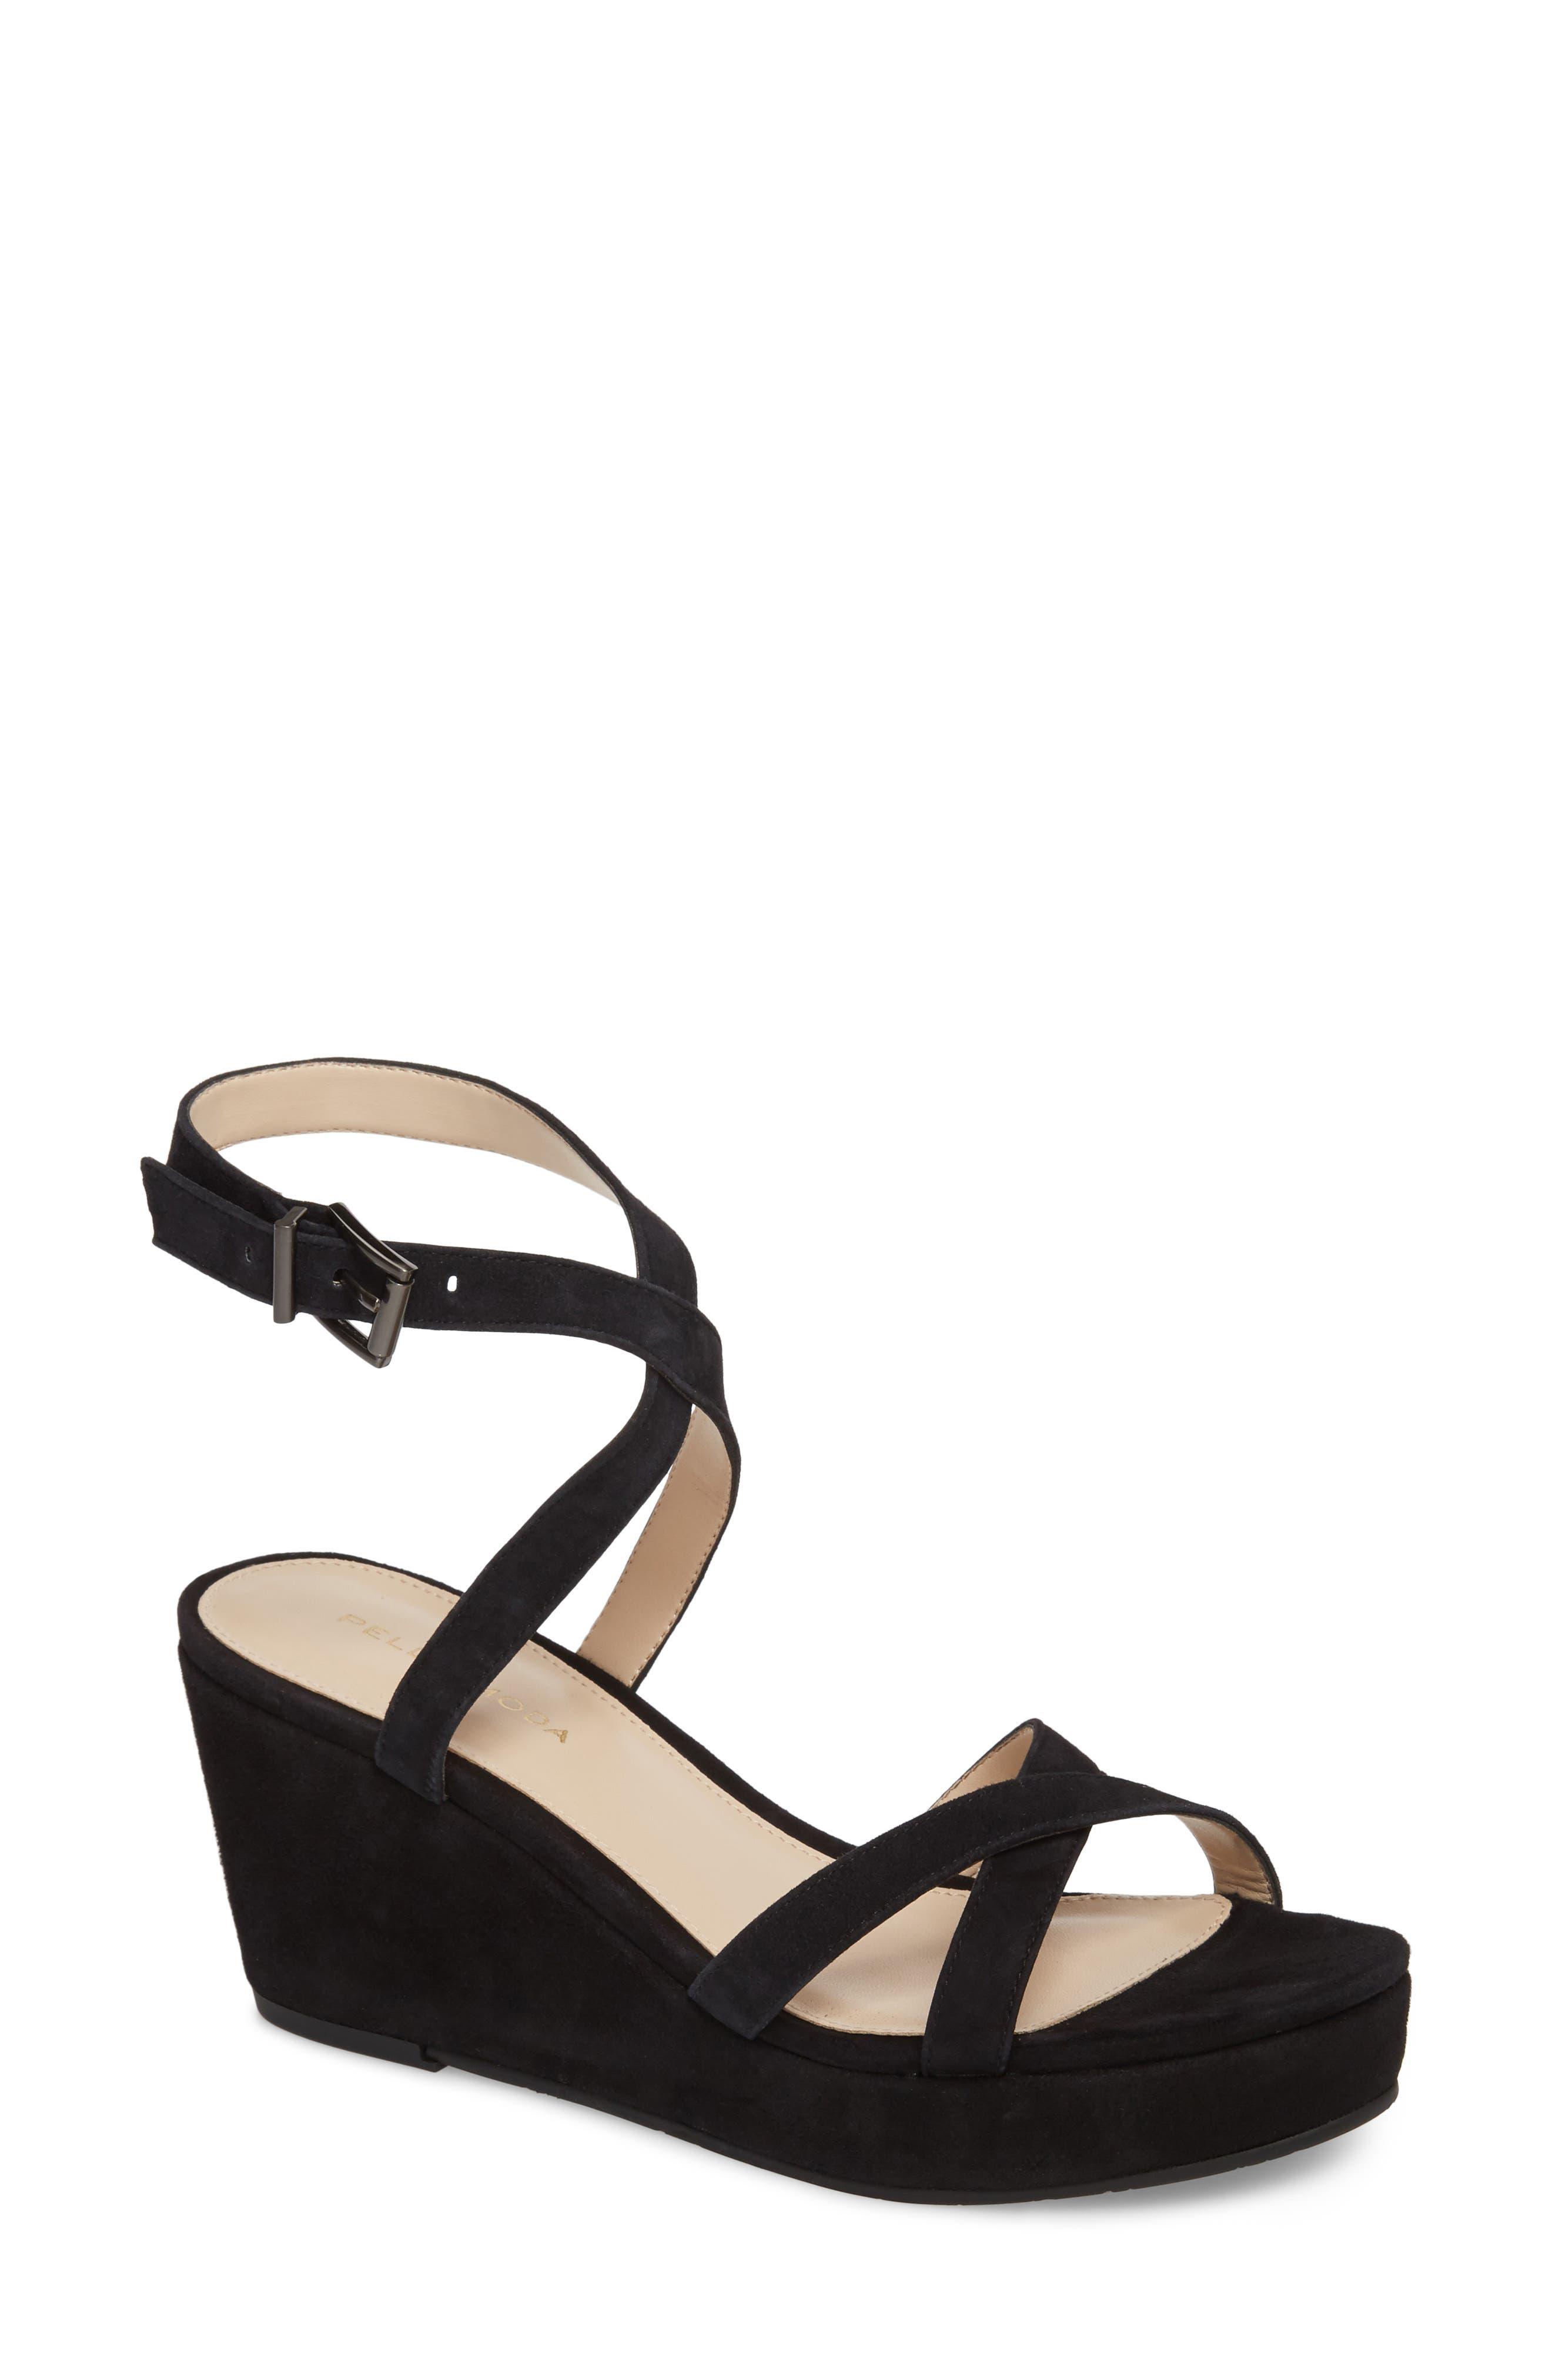 Keo2 Platform Wedge Sandal,                             Main thumbnail 1, color,                             BLACK SUEDE